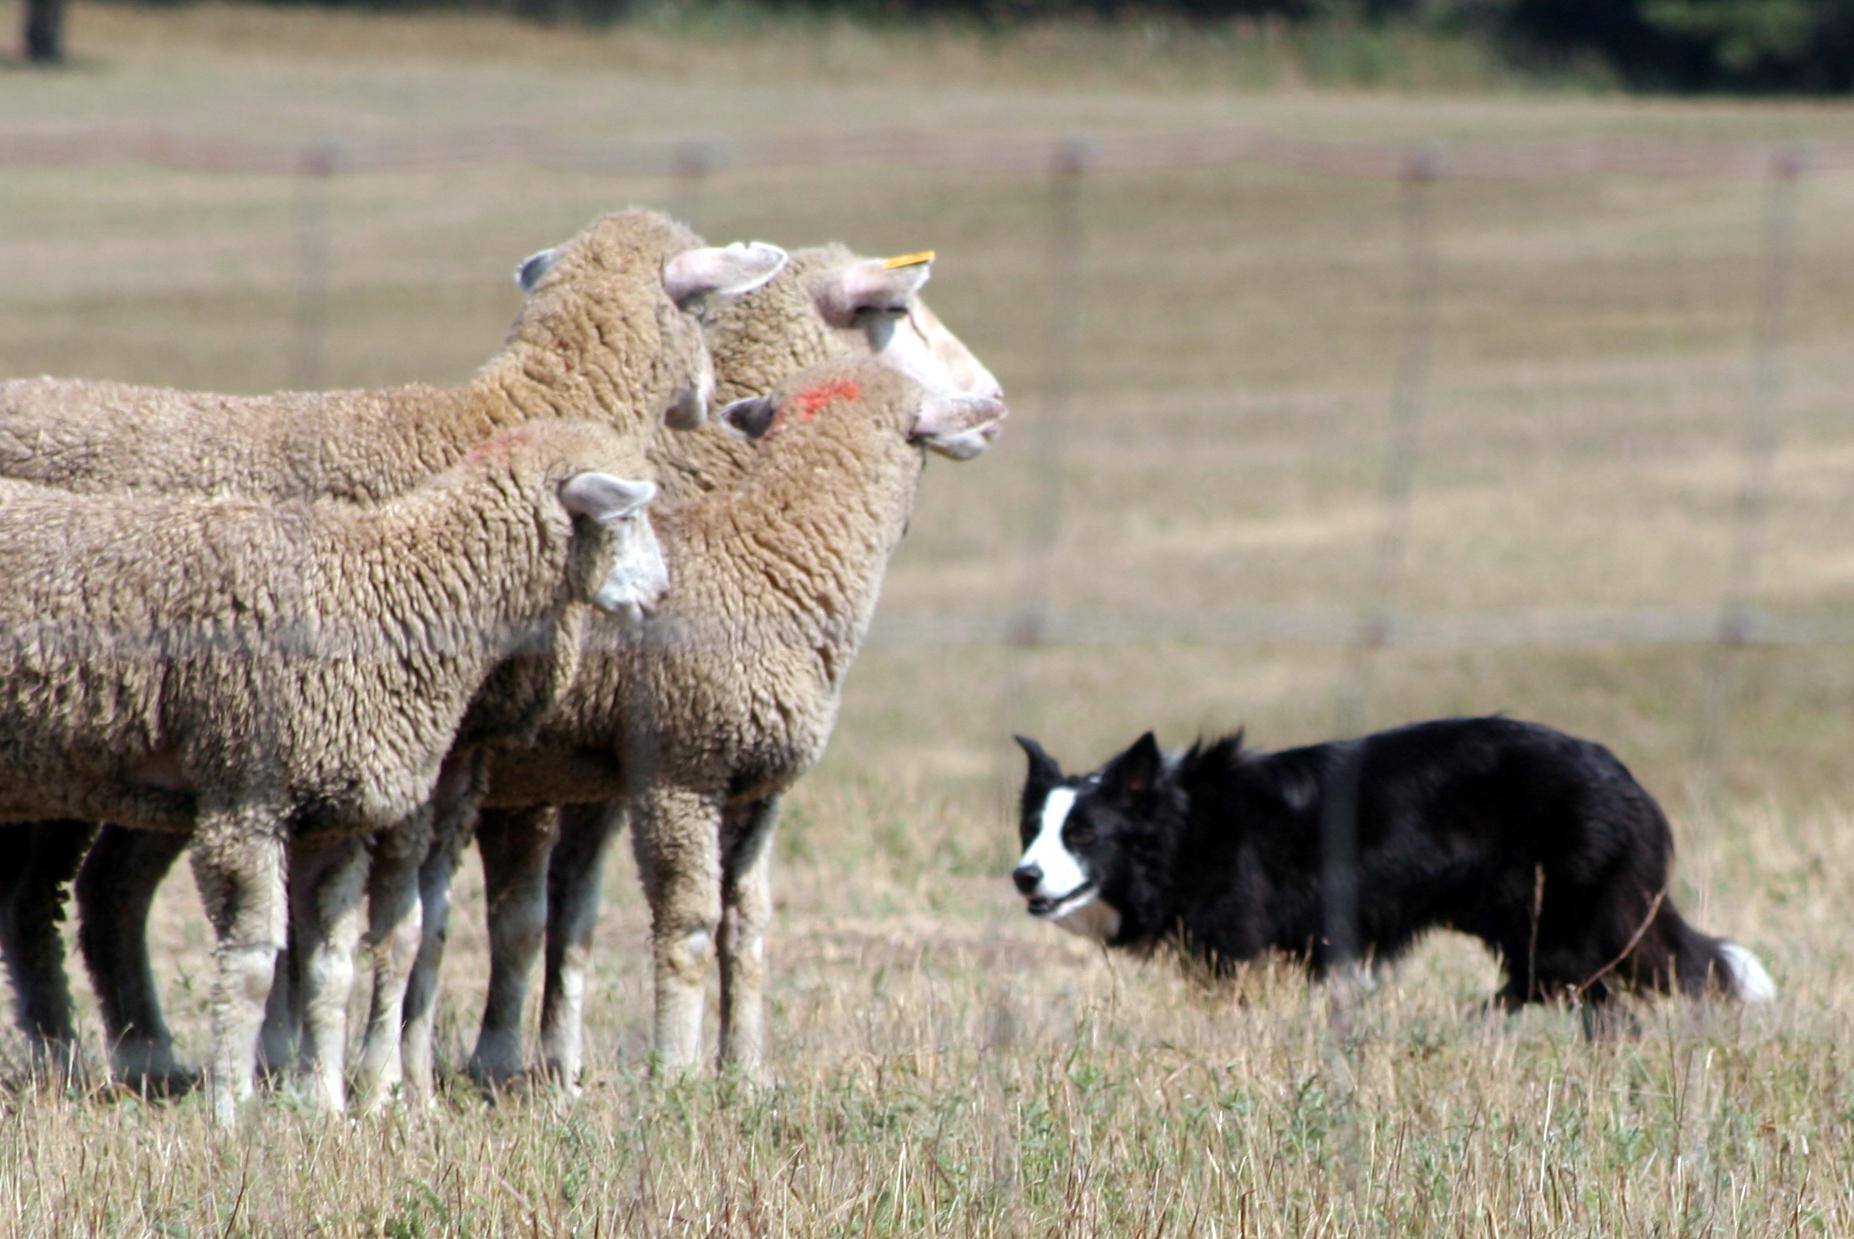 Border Collie gives sheep the eye